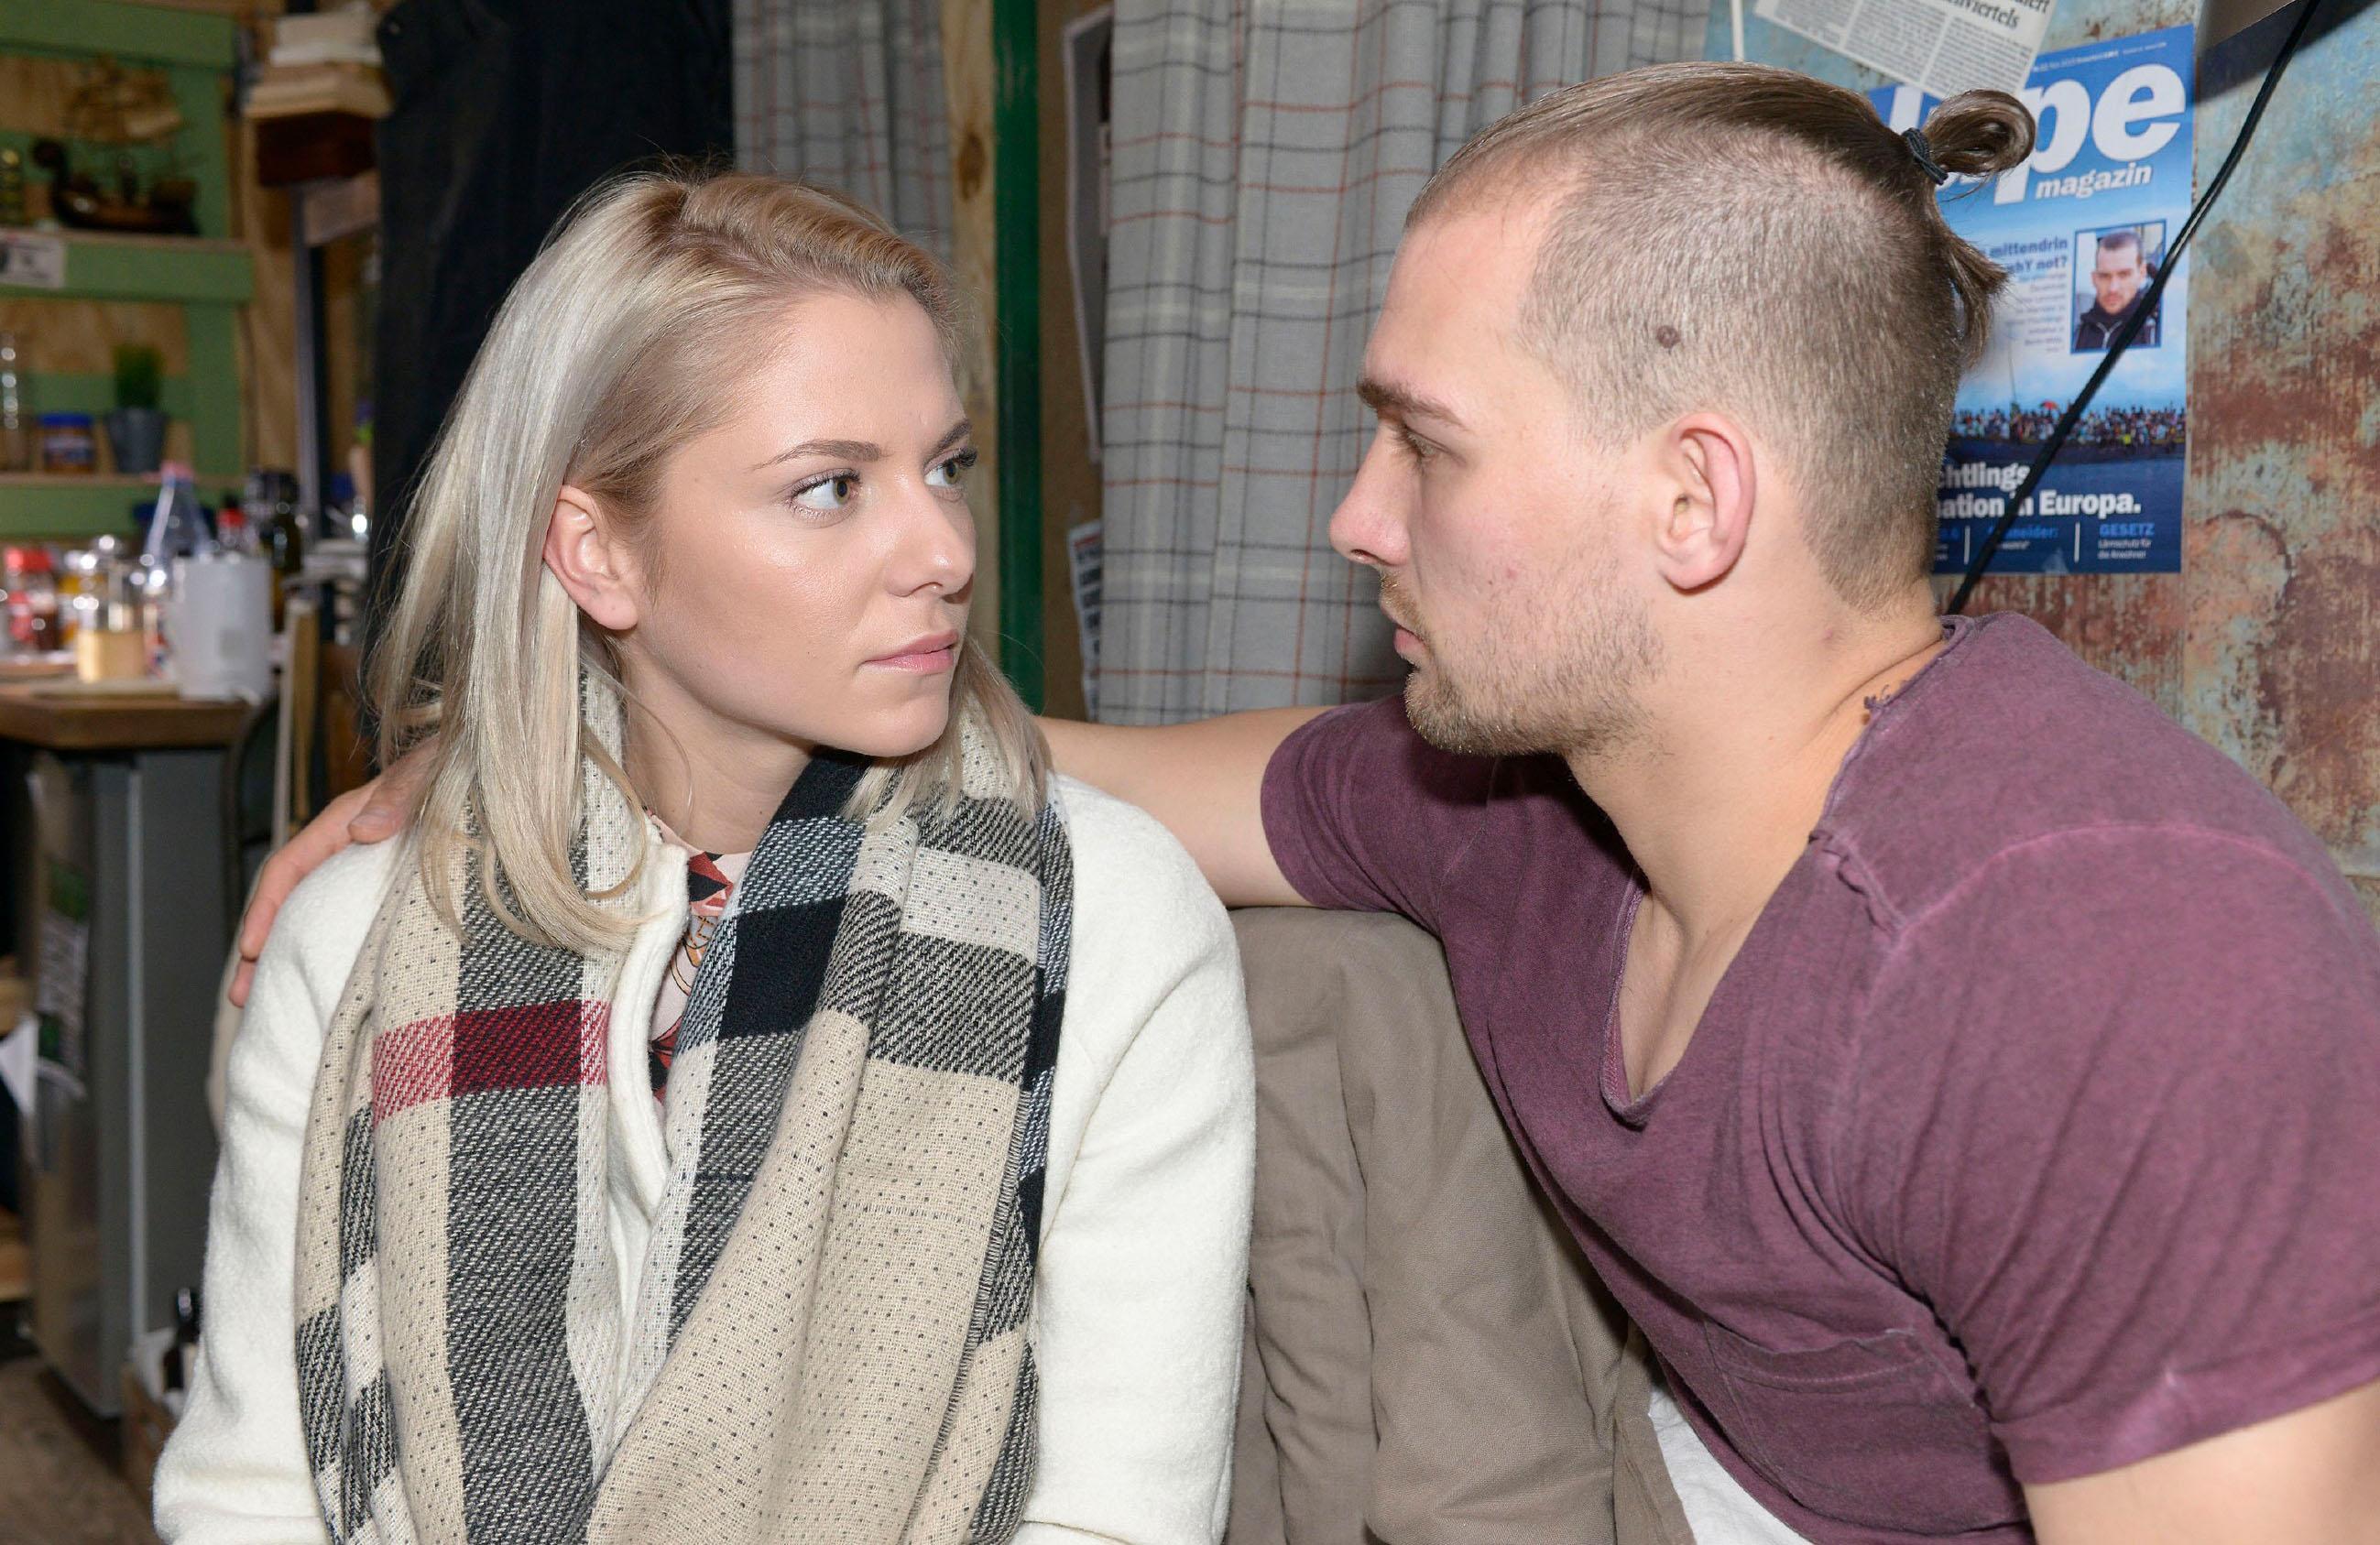 GZSZ: Felix will Berlin sofort verlassen - TV News